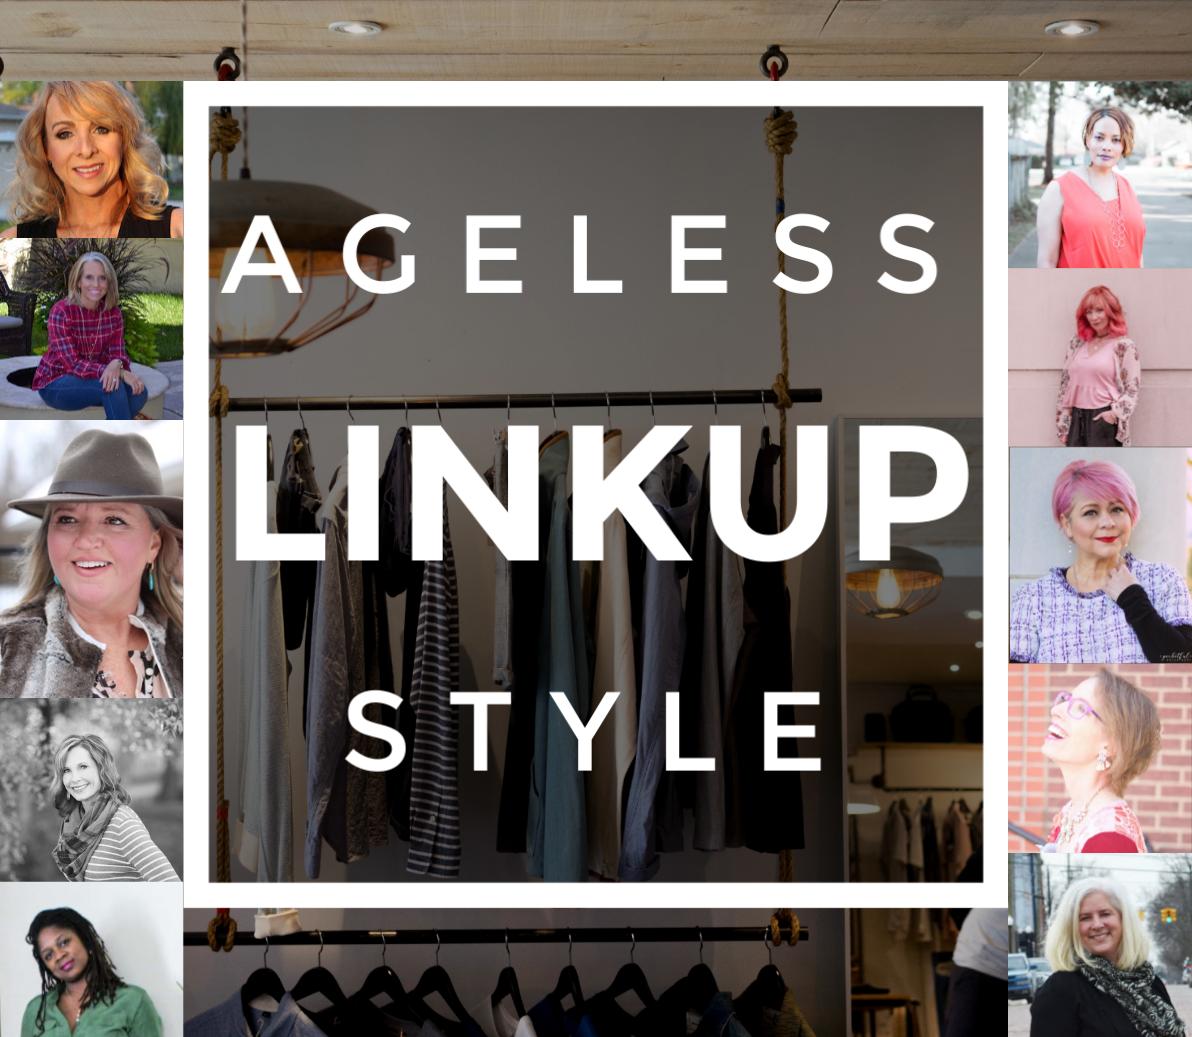 Ageless Style Linkup